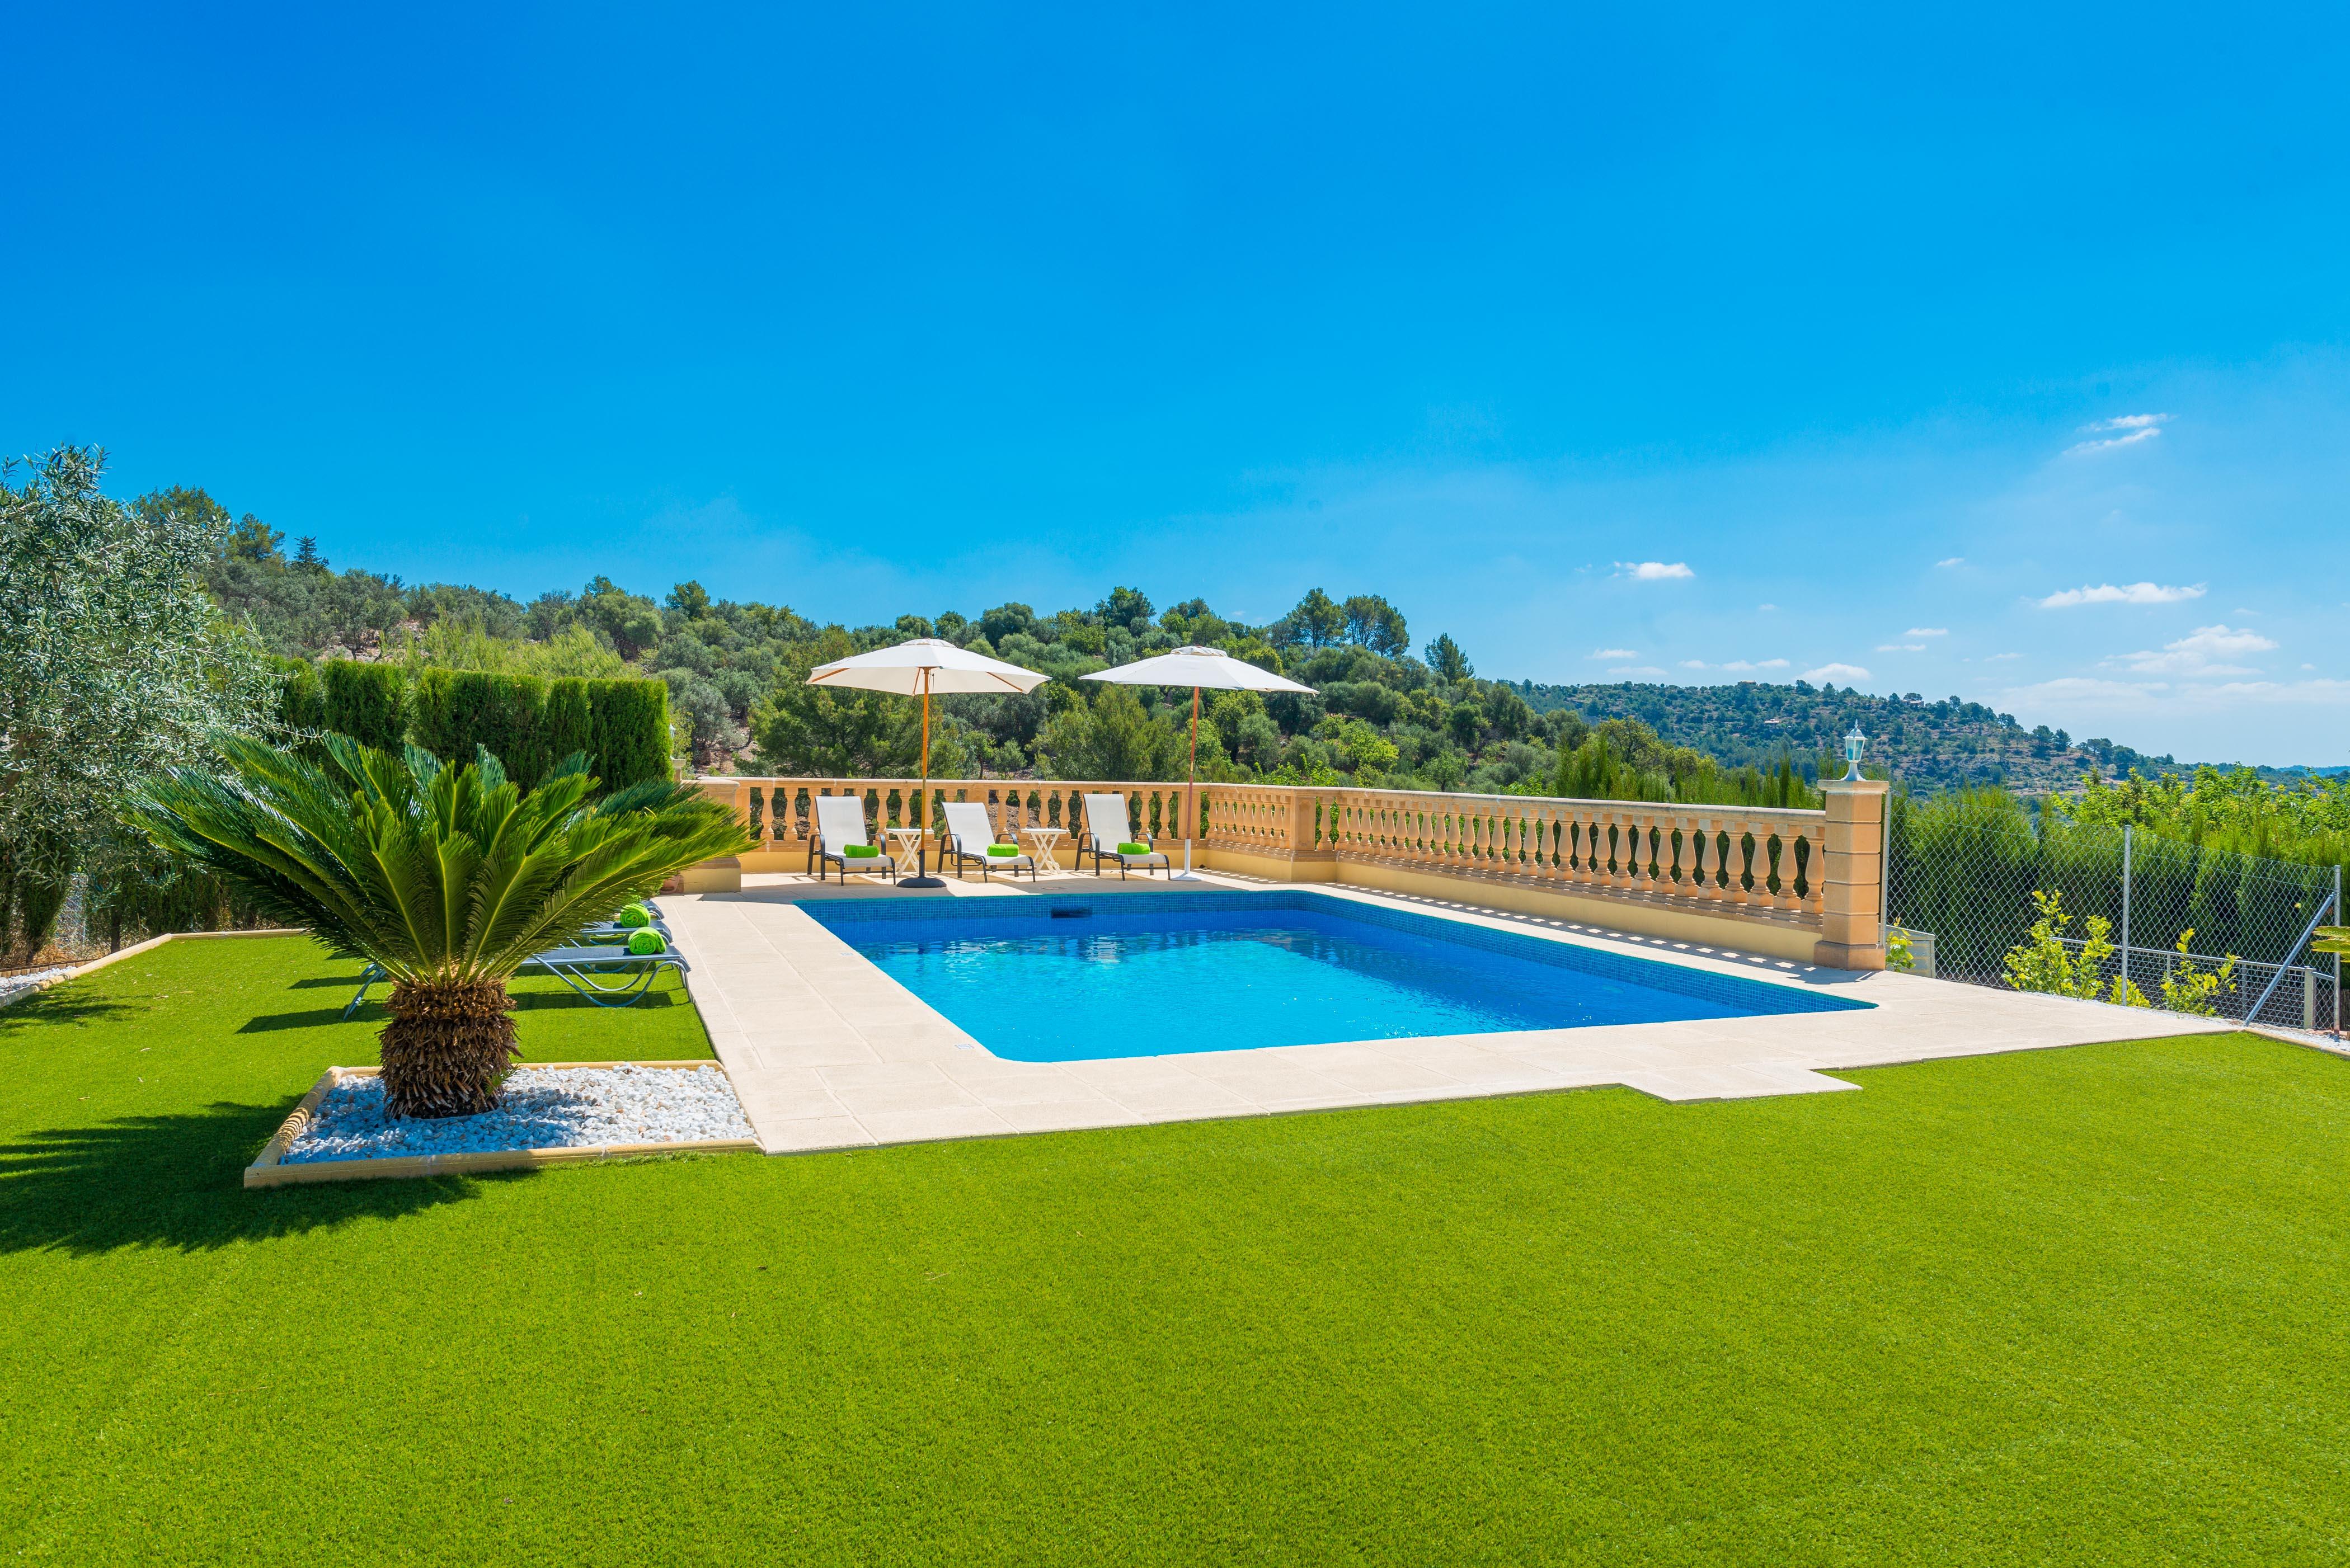 Ferienhaus SA TANCA (MANCORINA) (2037553), Mancor de la Vall, Mallorca, Balearische Inseln, Spanien, Bild 25